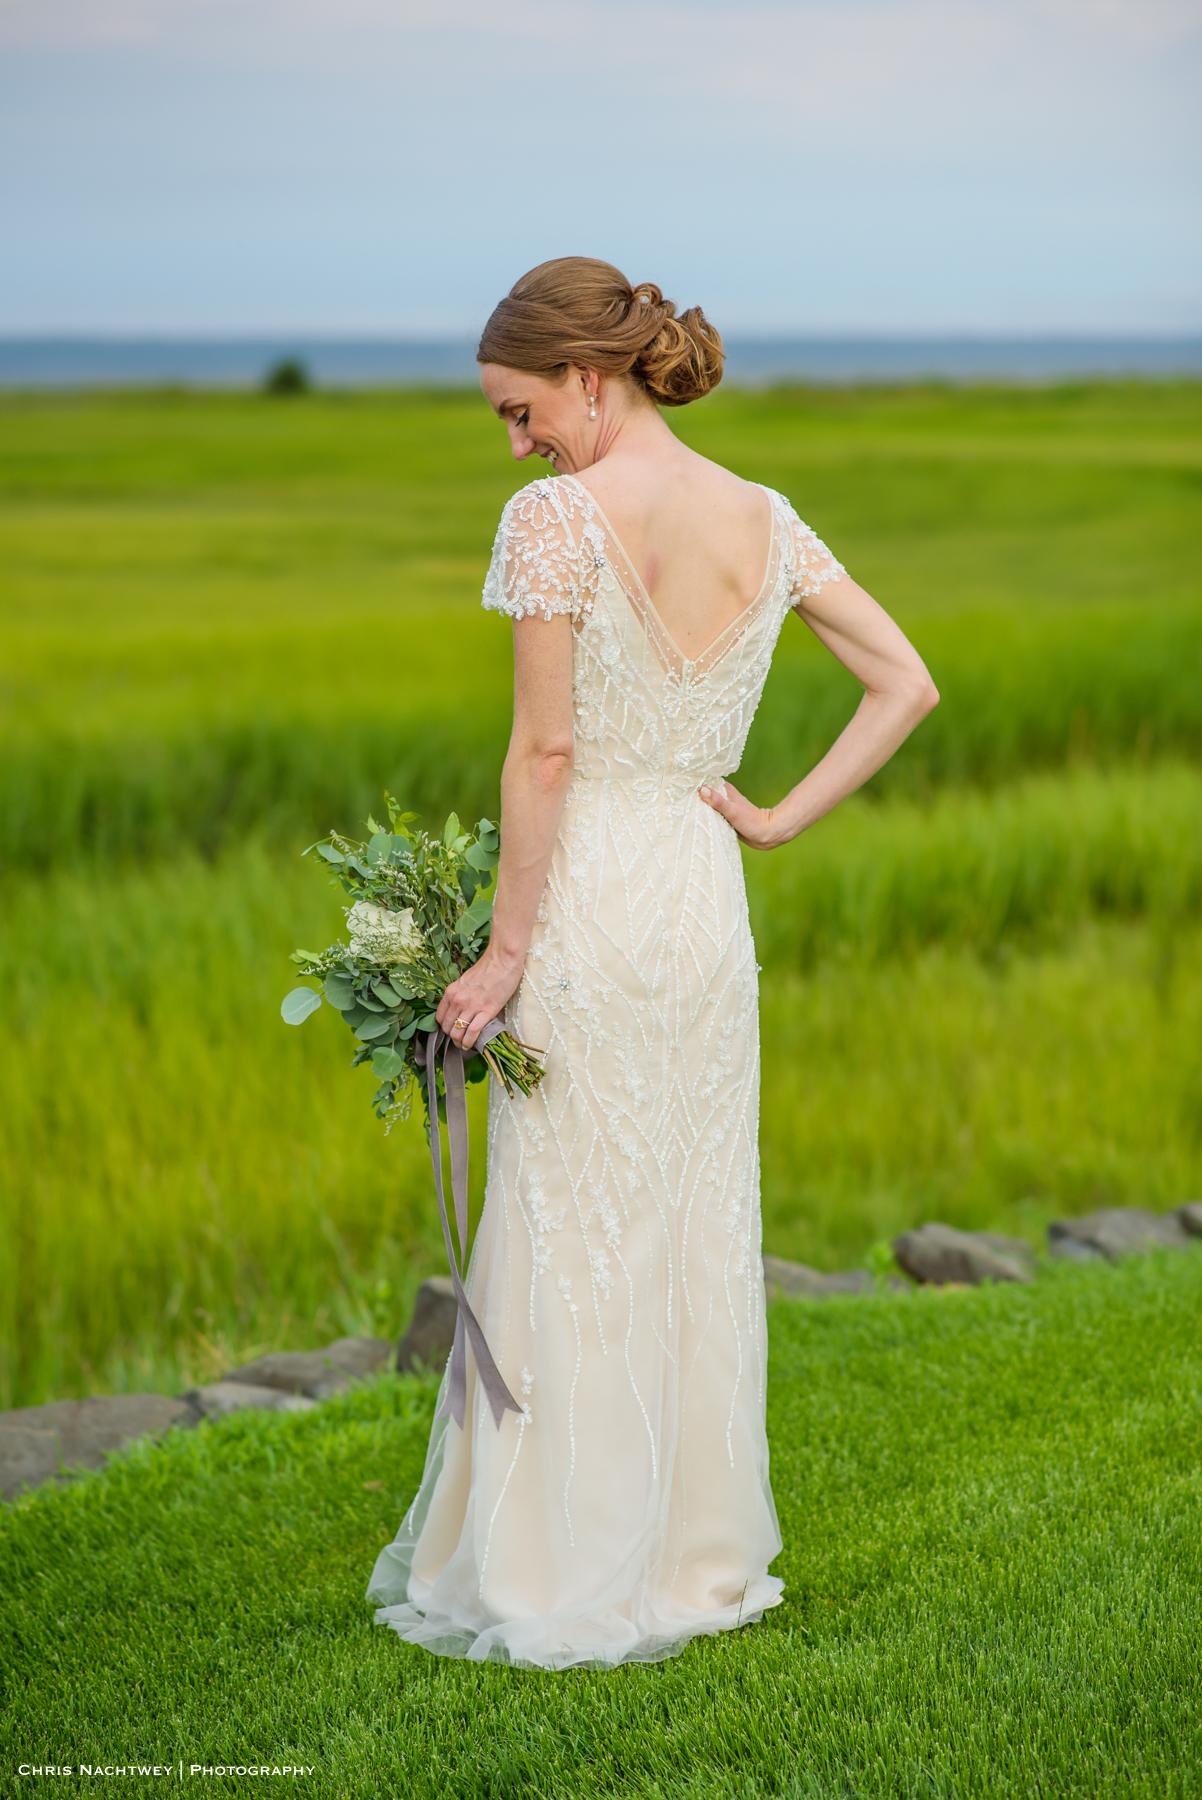 photos-wedding-quidnessett-country-club-ri-chris-nachtwey-photography-2018-41.jpg